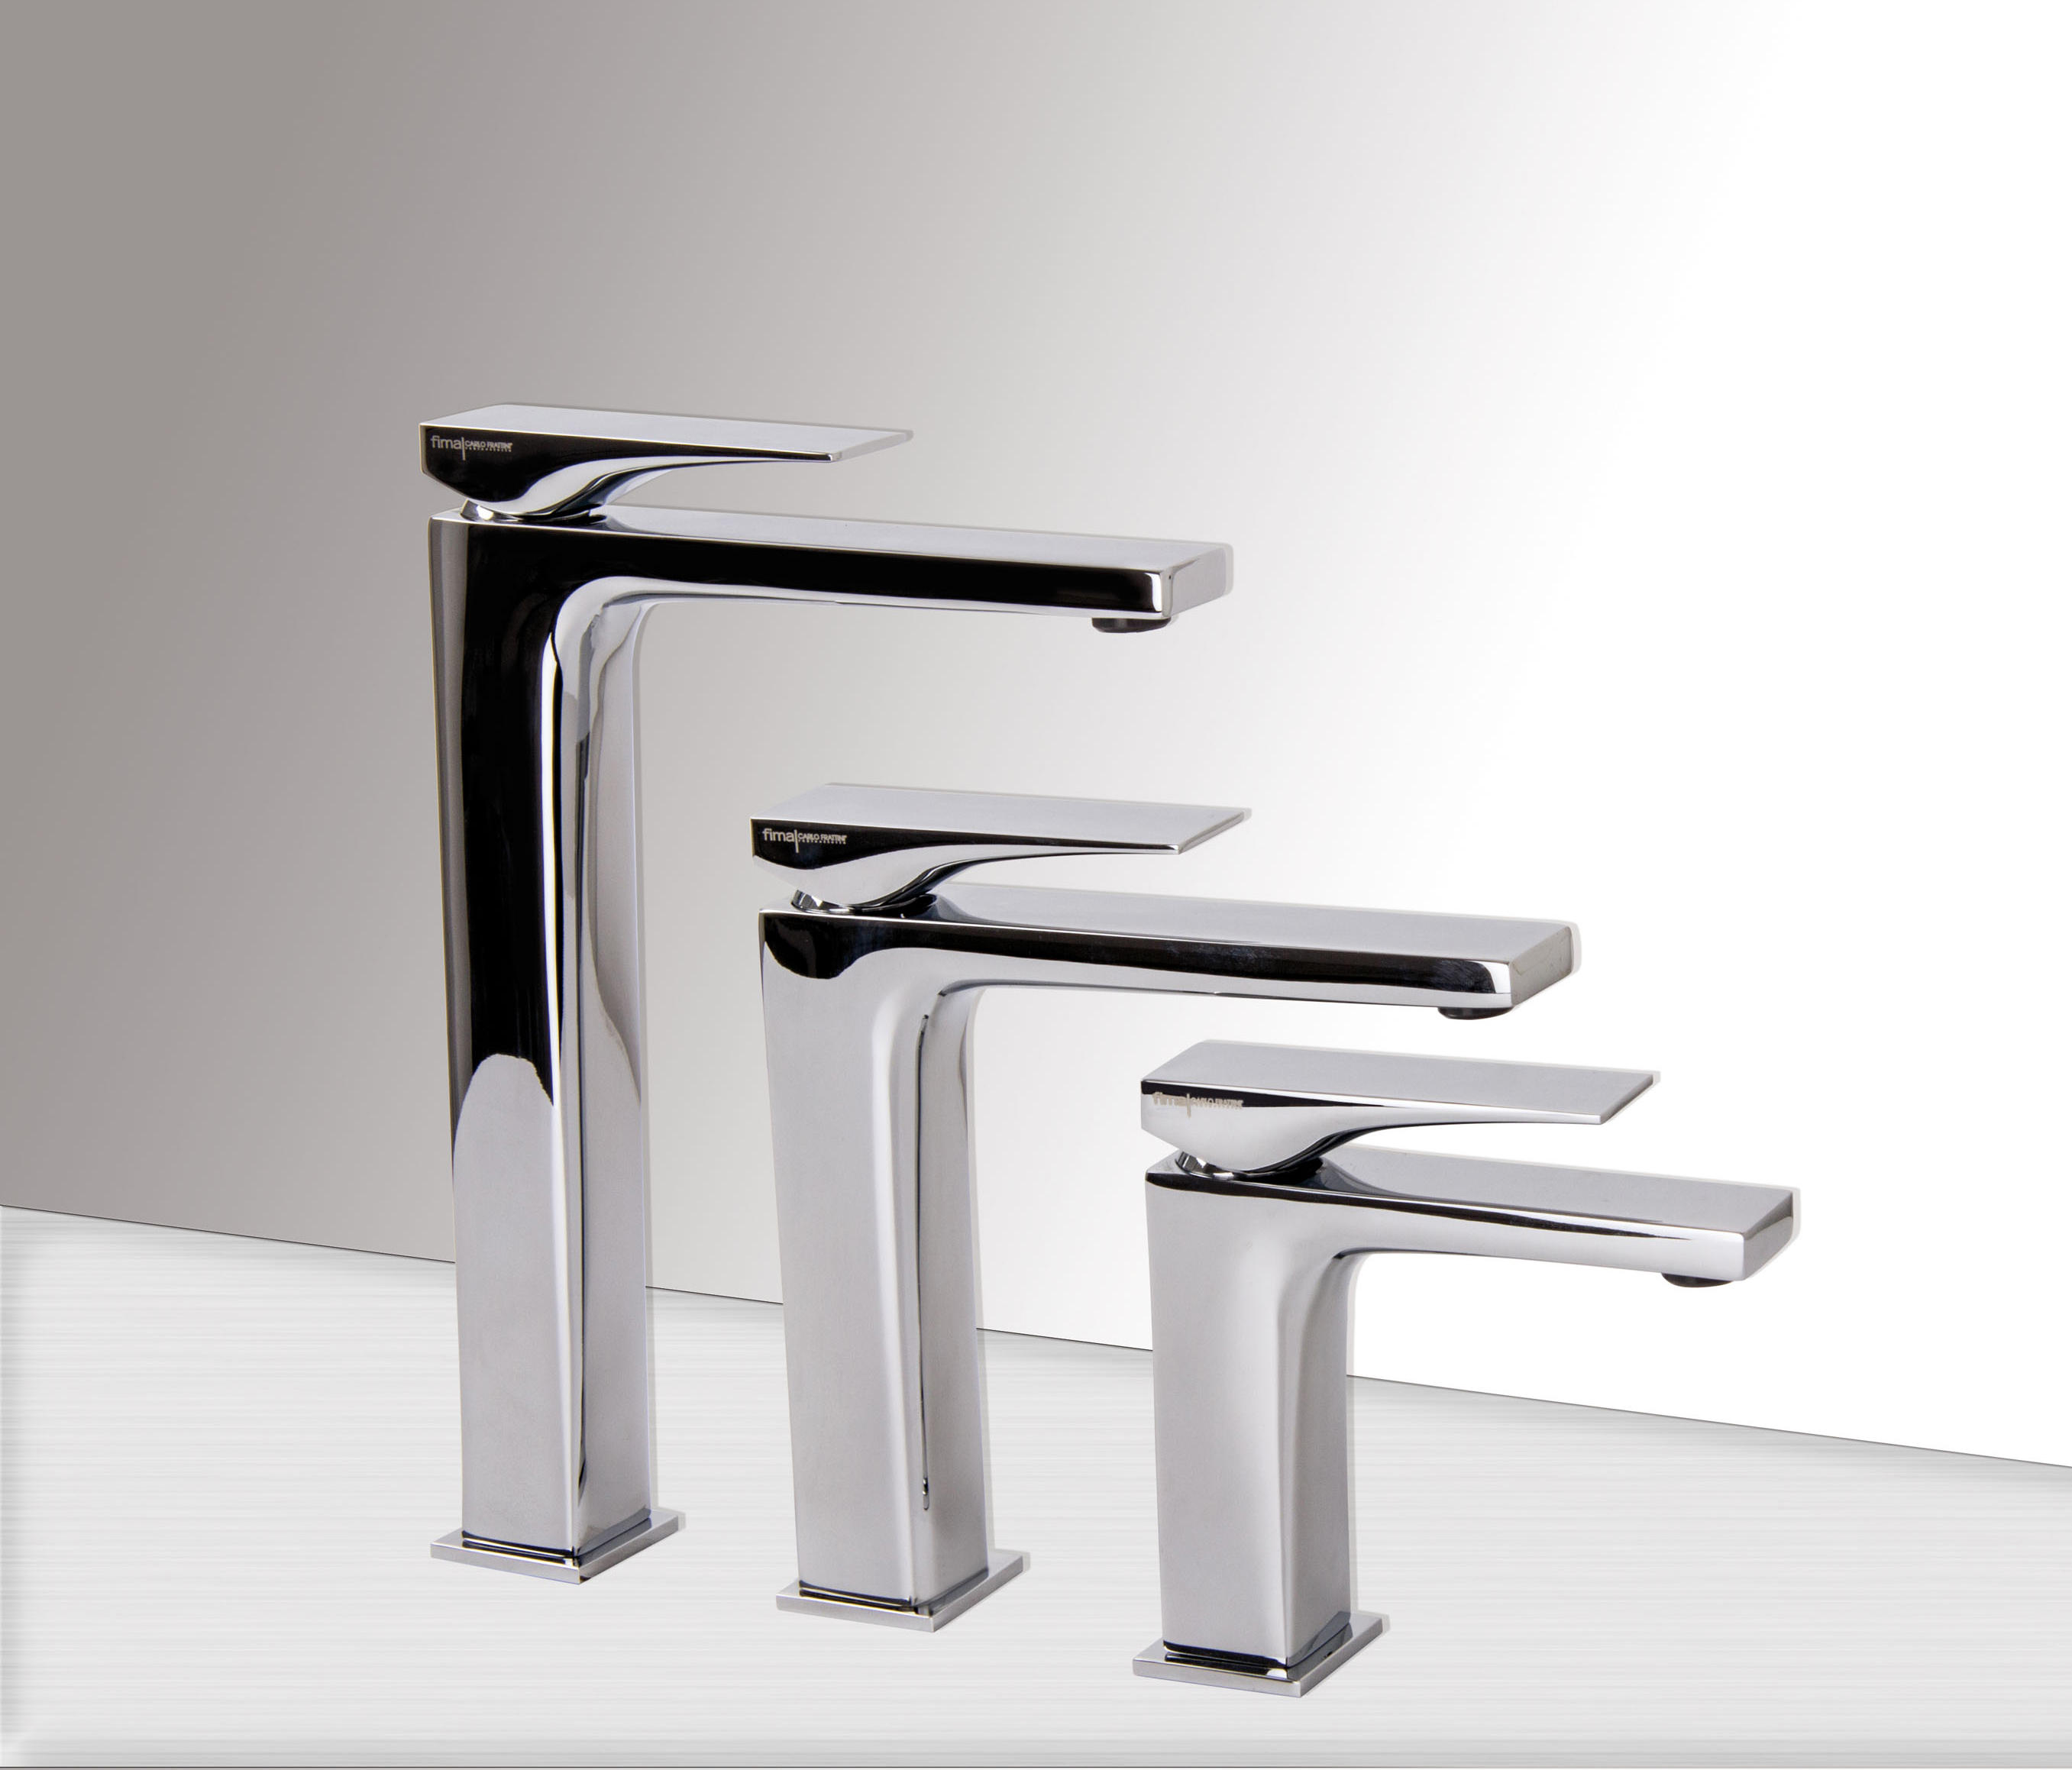 zeta f2415 rubinetteria per lavabi fima carlo frattini. Black Bedroom Furniture Sets. Home Design Ideas